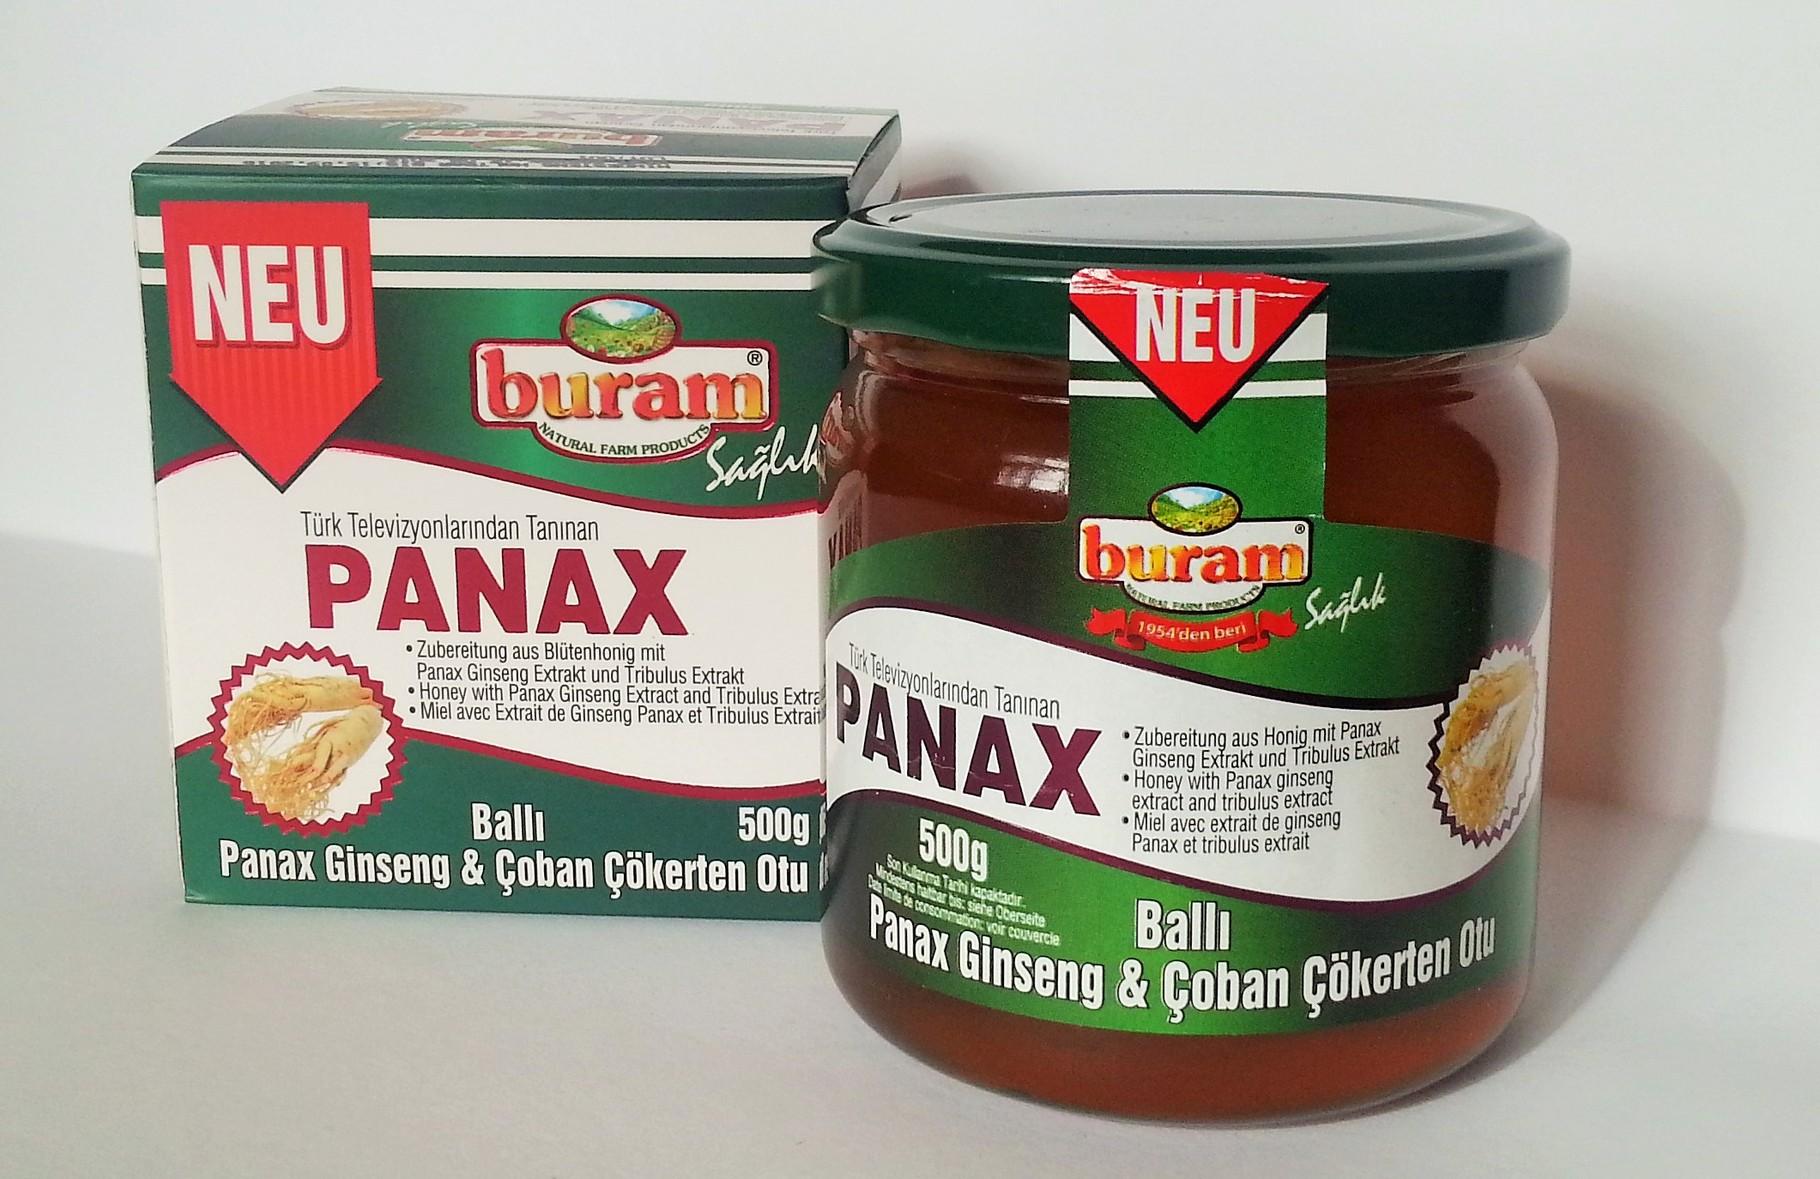 Panax 500g